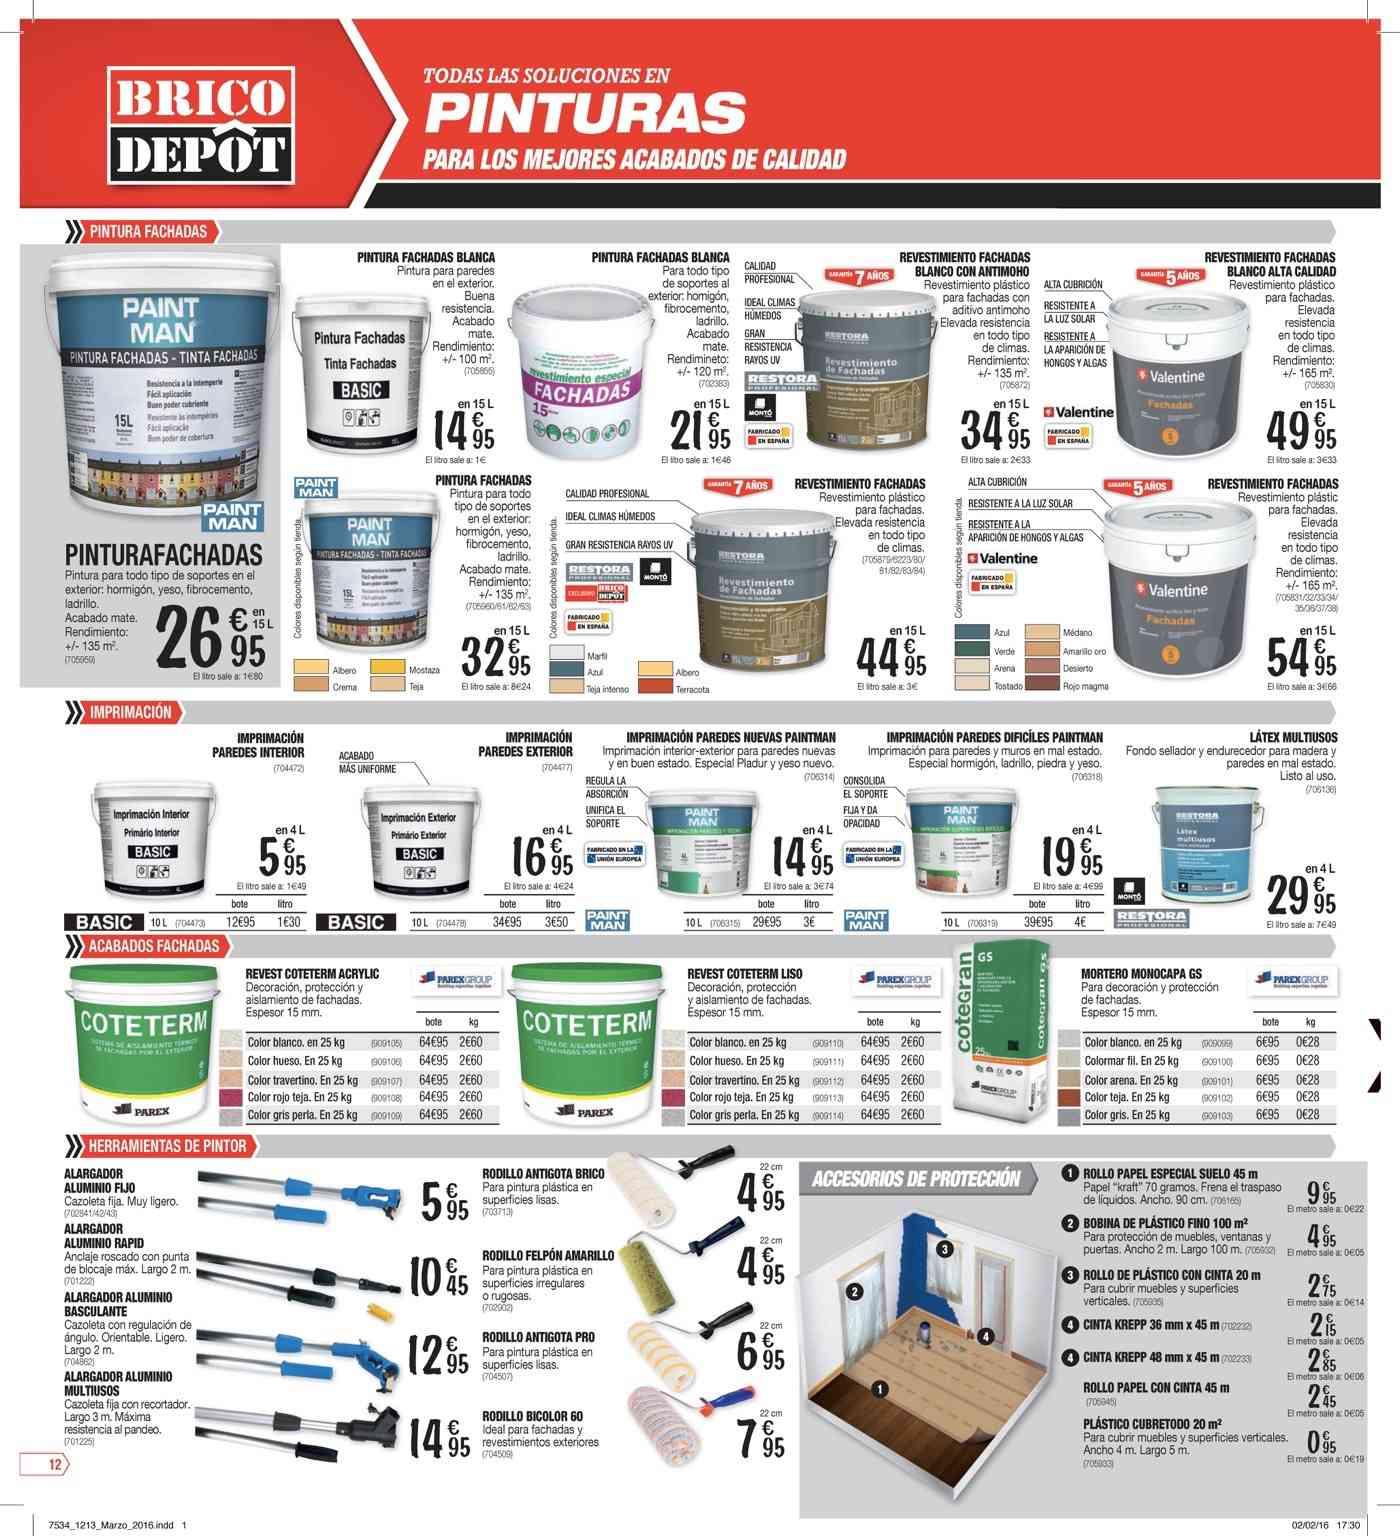 bricodepot catalogo marzo 2016 ofertas _Page_12